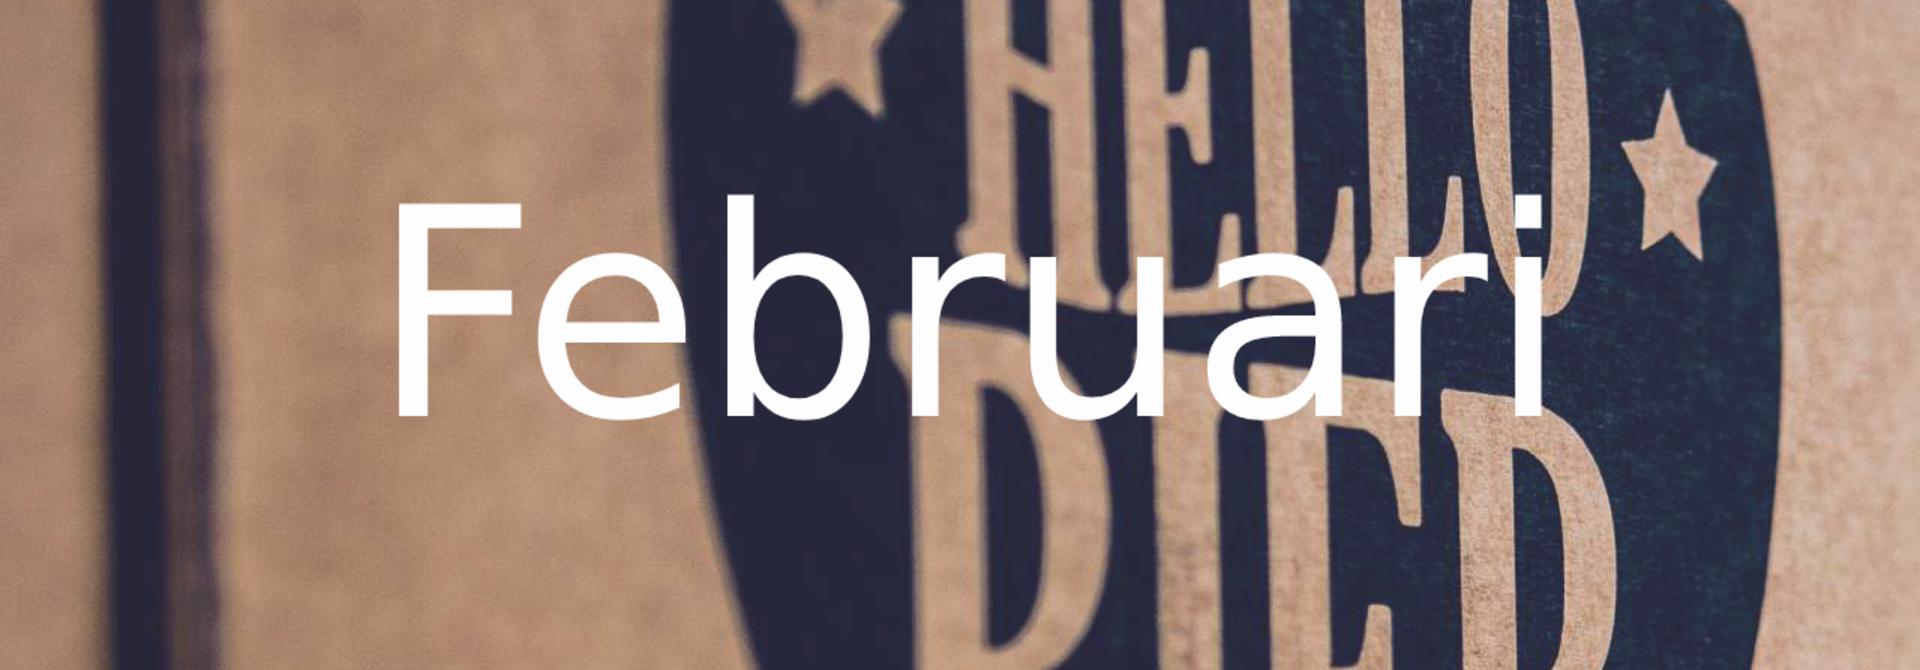 Speciaalbier – bierpakket februari 2018